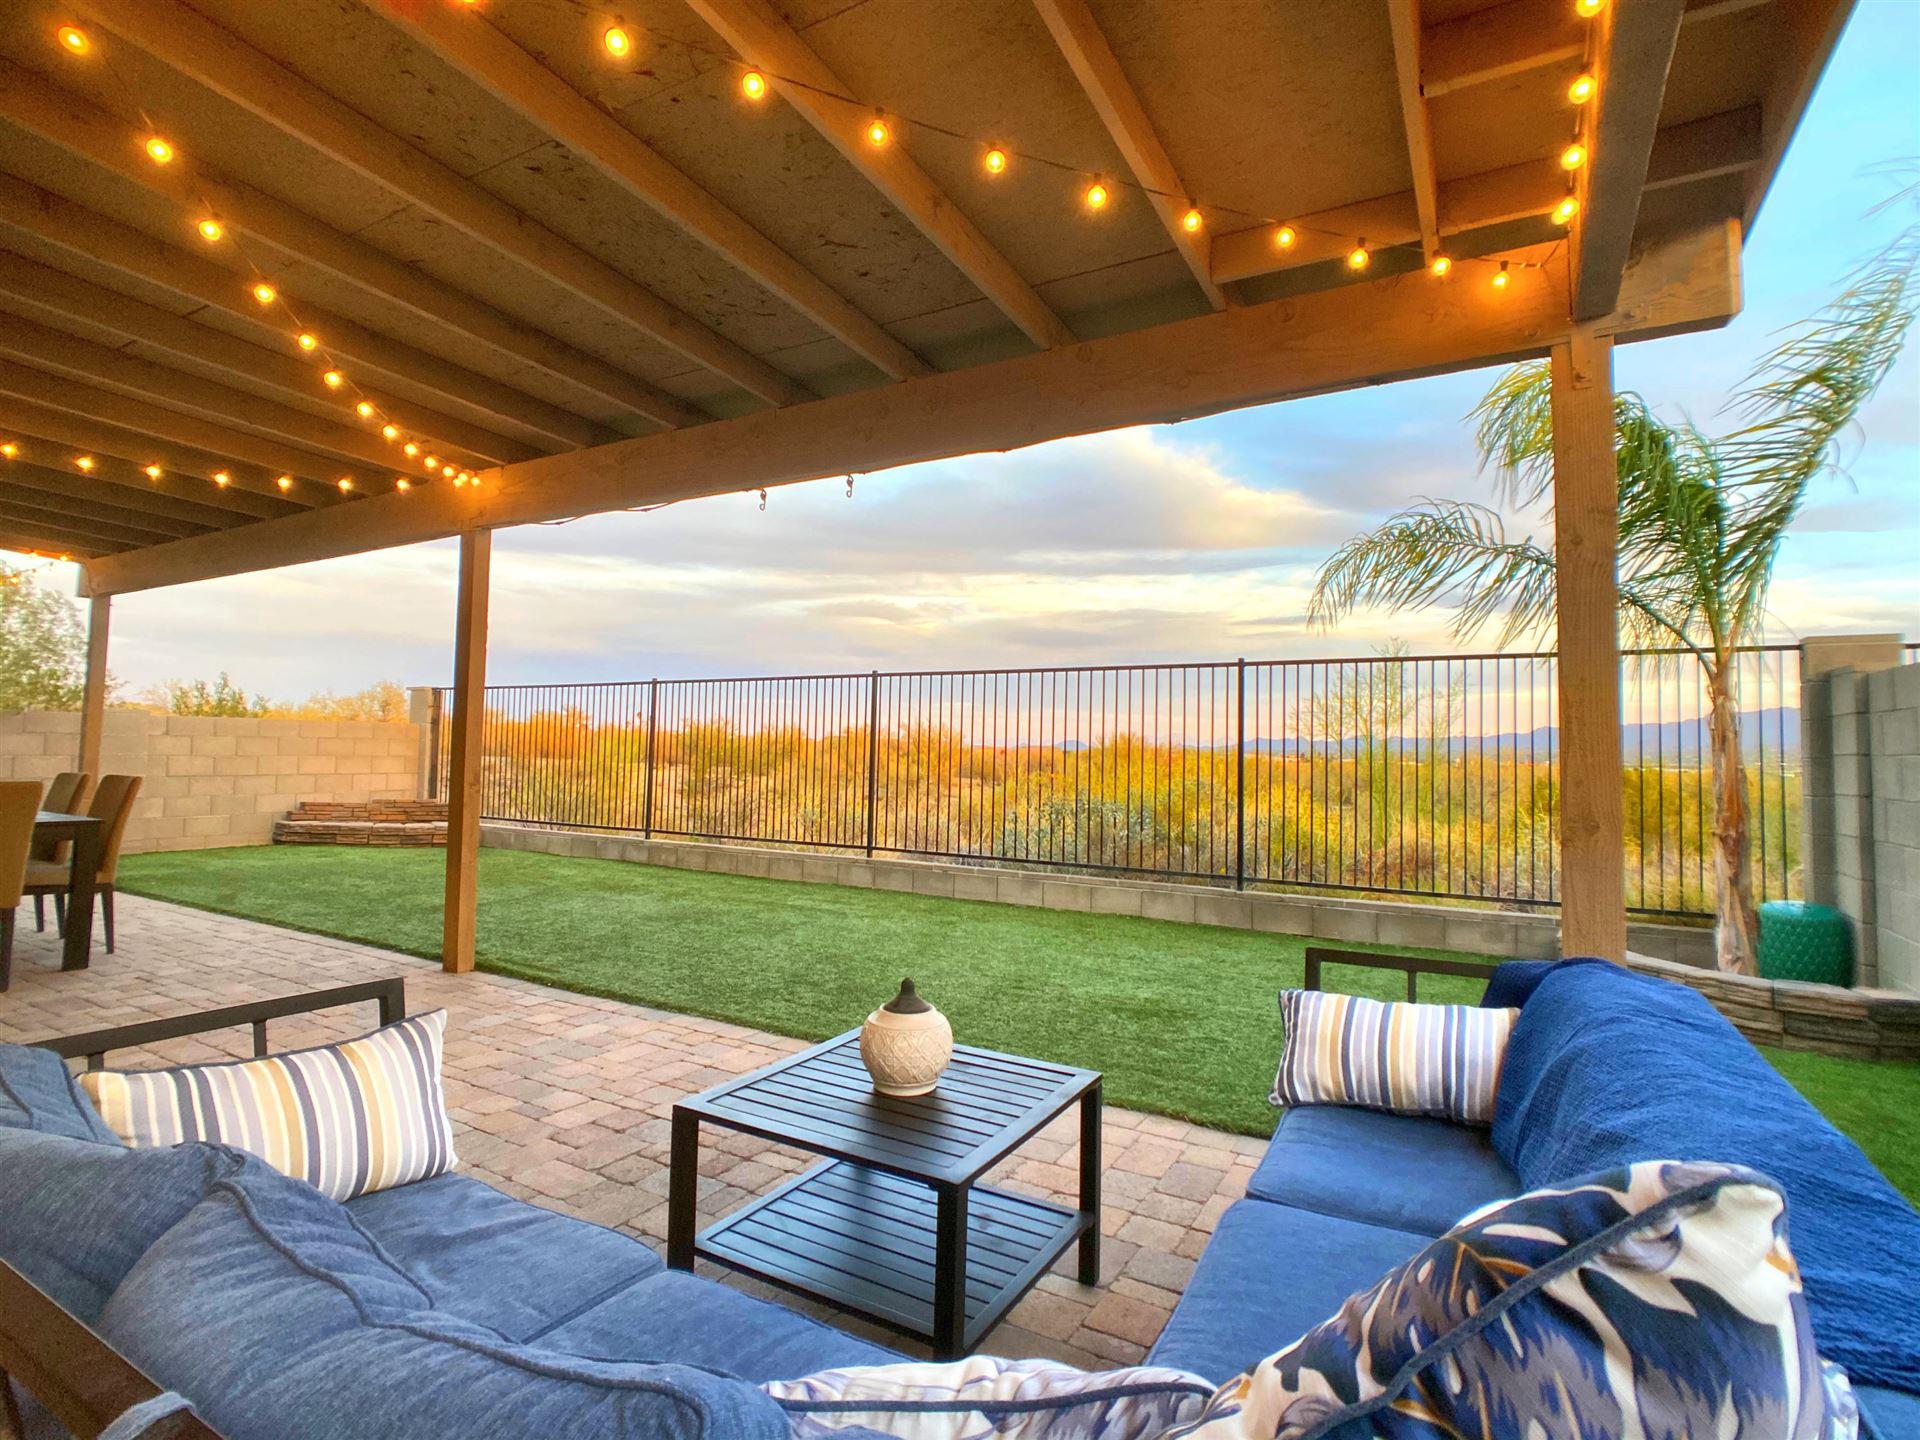 5717 W Rattler Street, Tucson, AZ 85742 - MLS#: 22109807